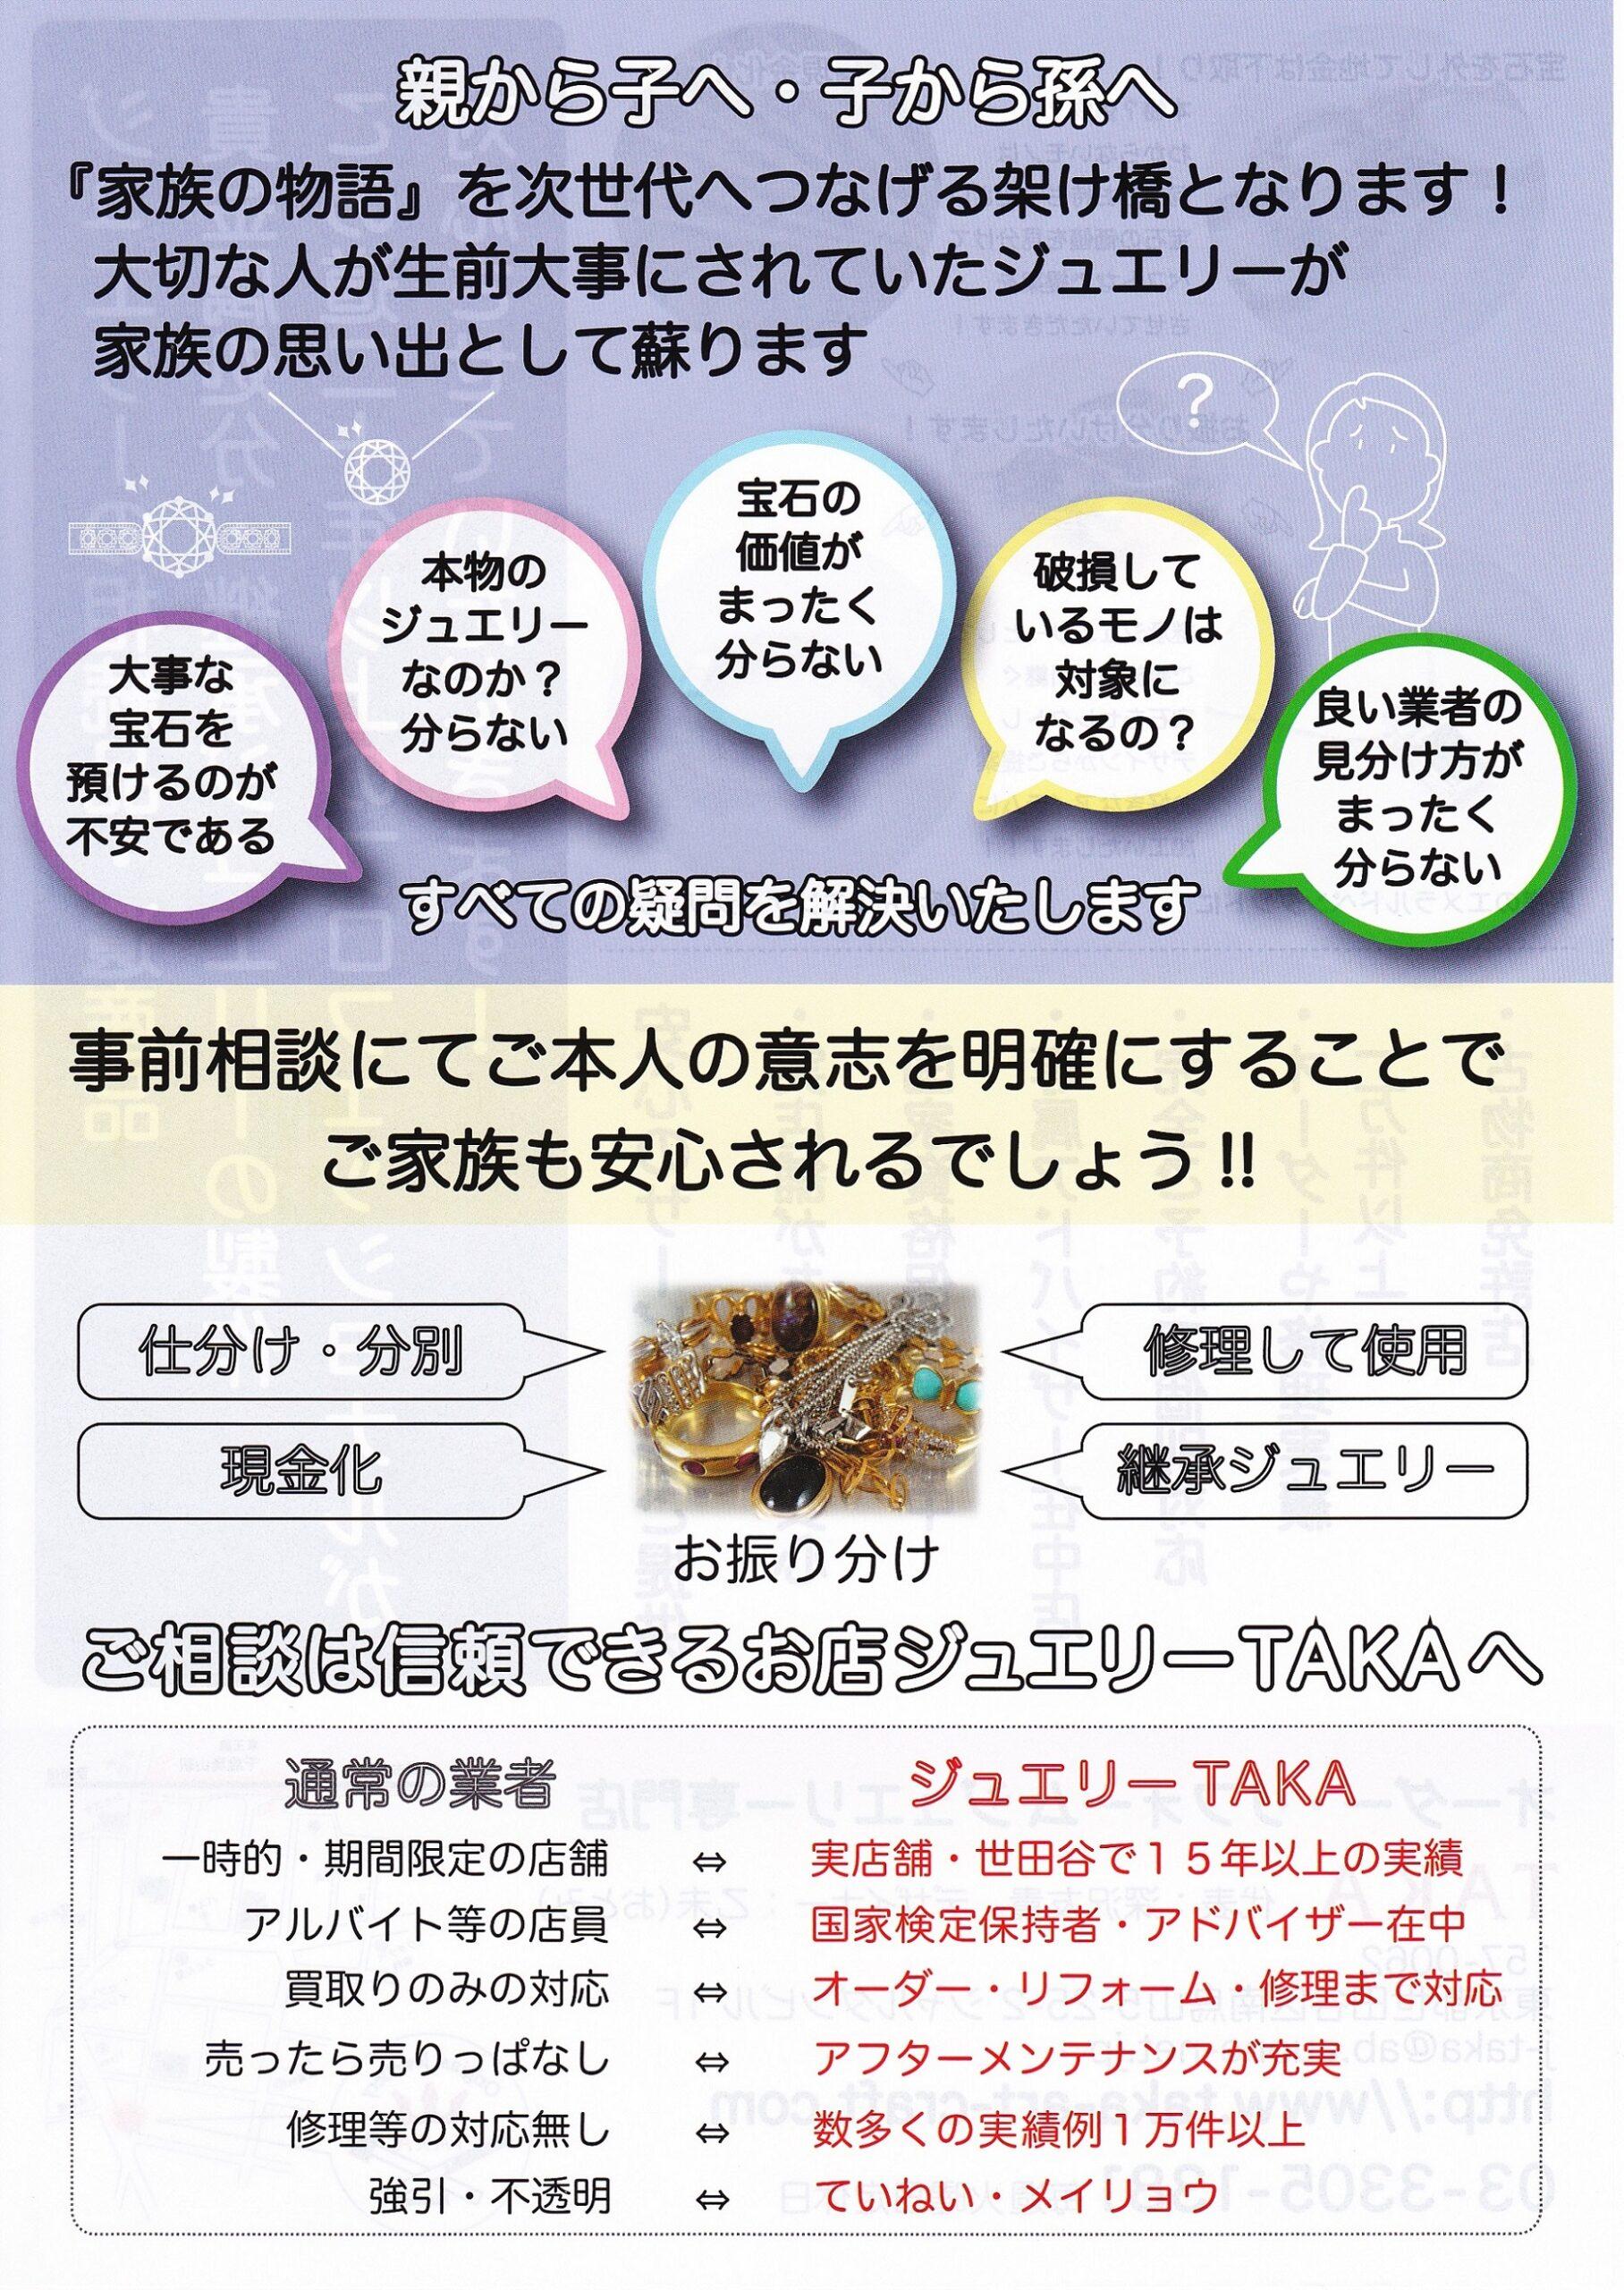 TAKA地金買取システム